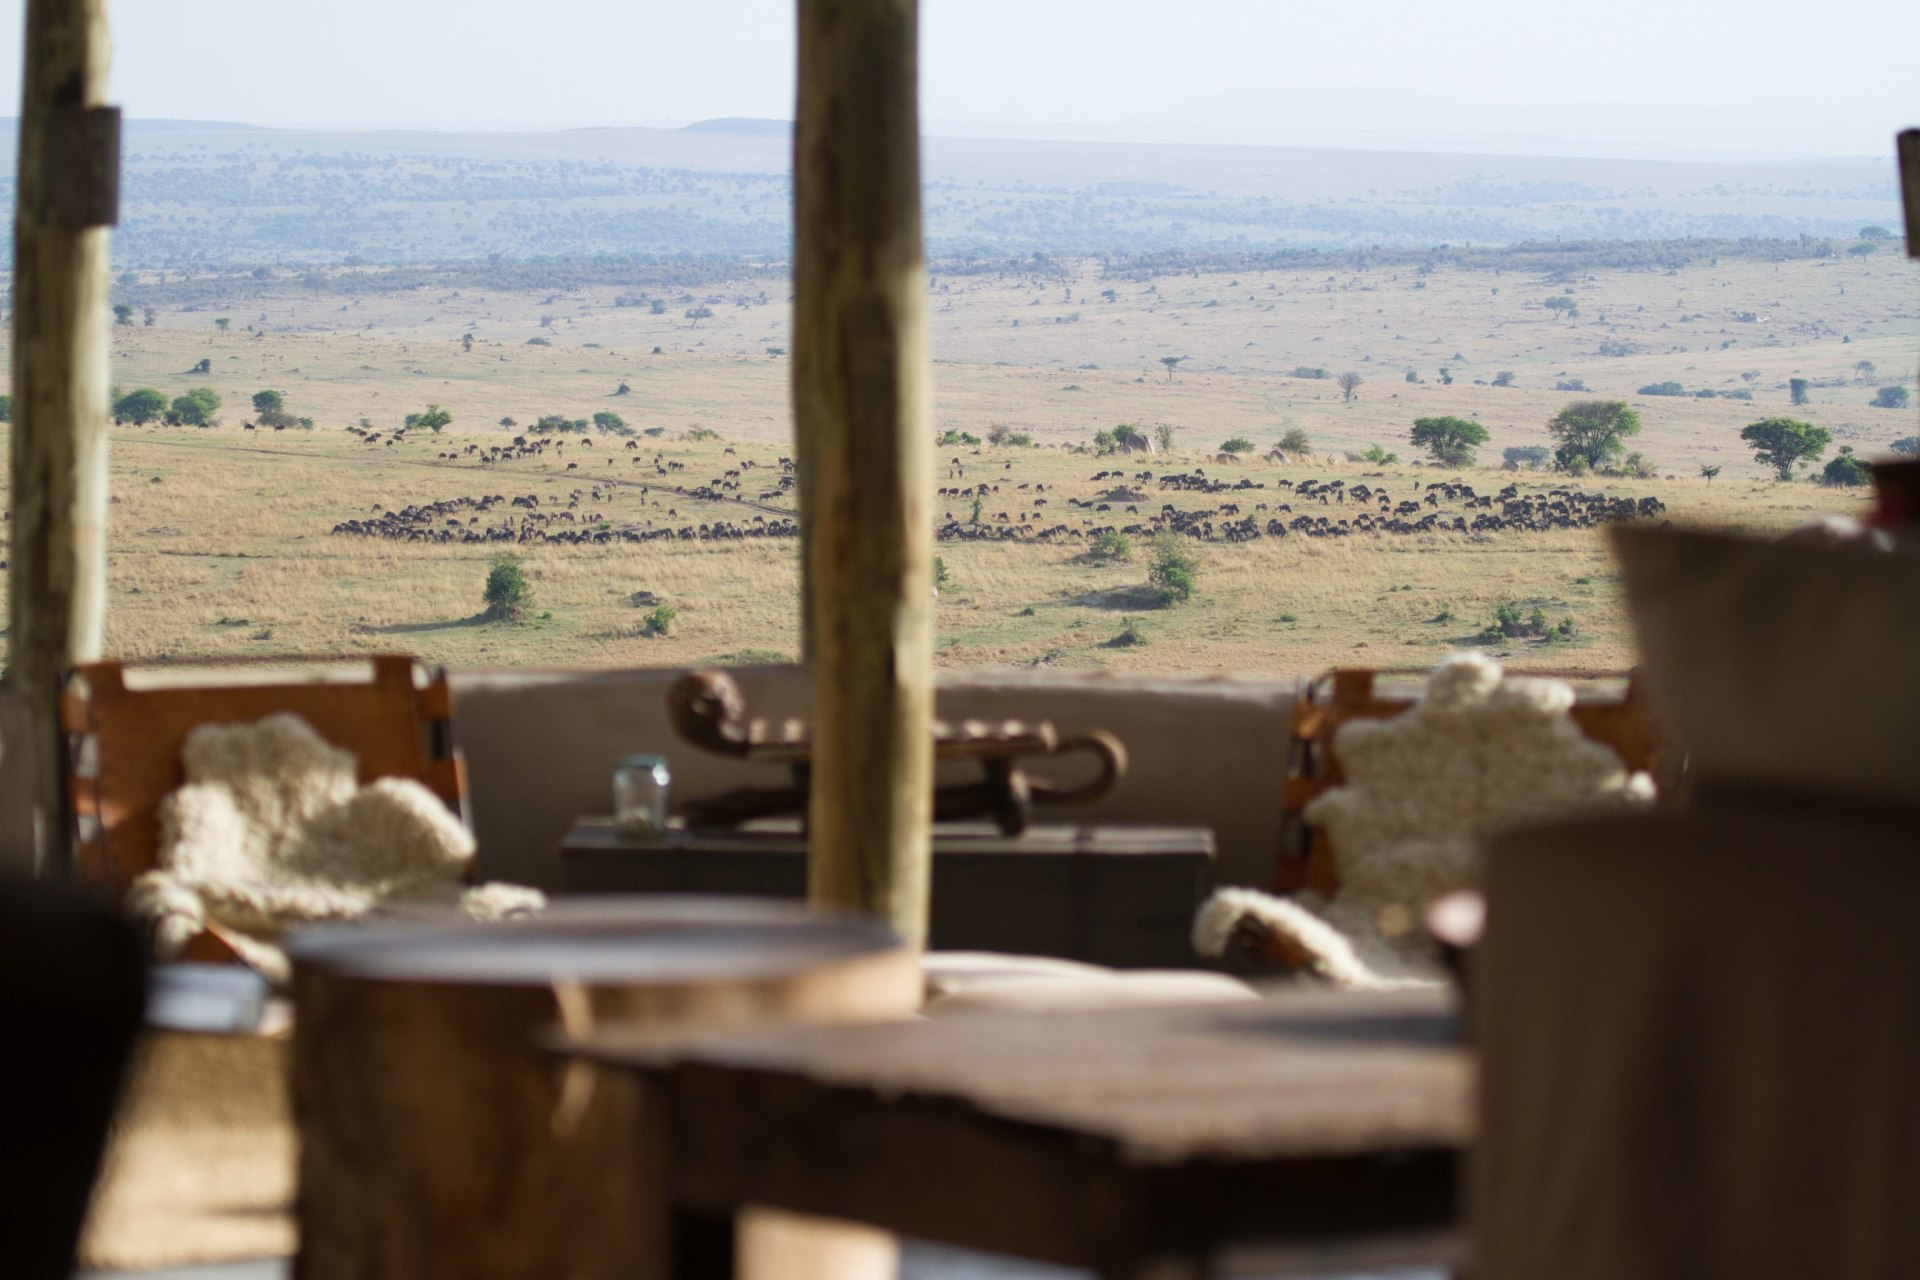 Ausblick vom Lamai Serengeti auf Gnuherden